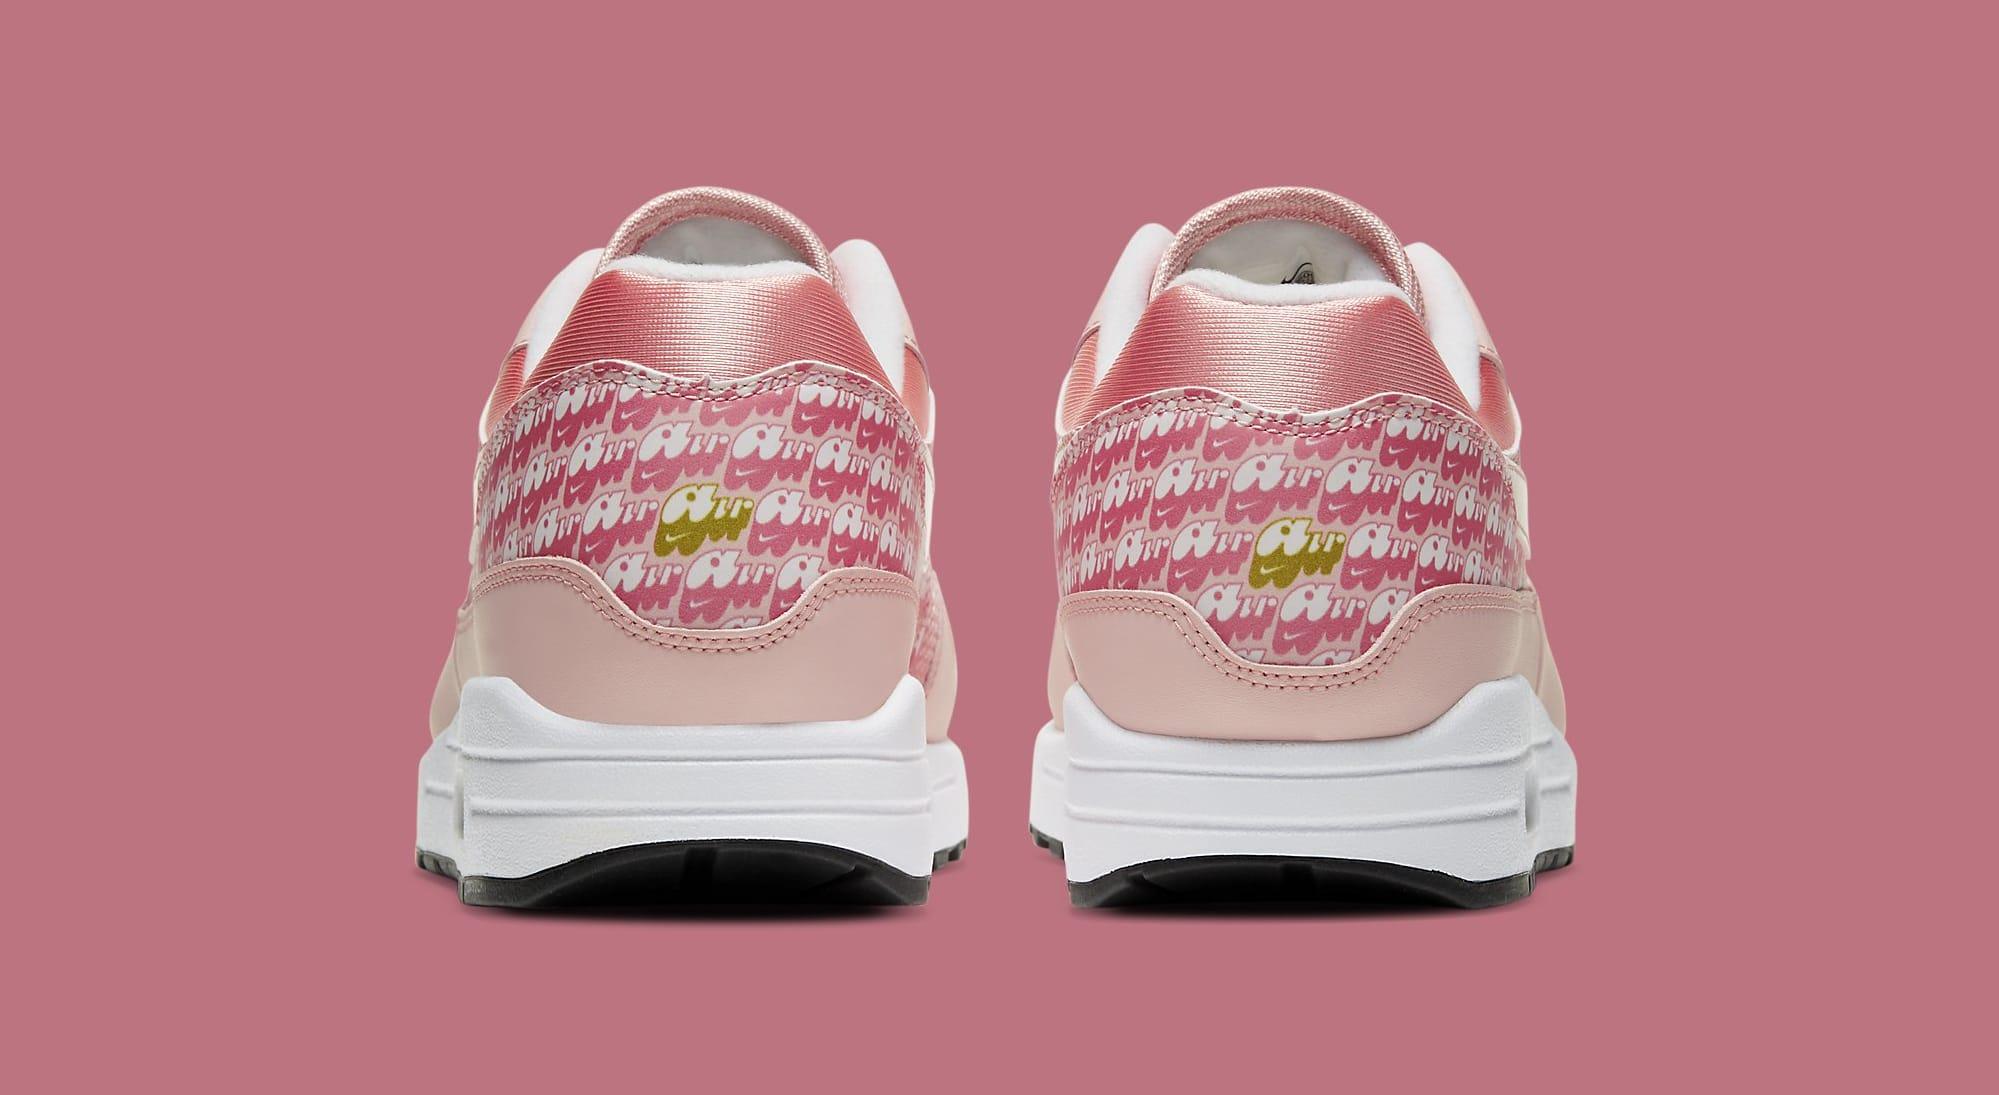 Nike Air Max 1 'Strawberry Lemonade' CJ0609-600 Heel